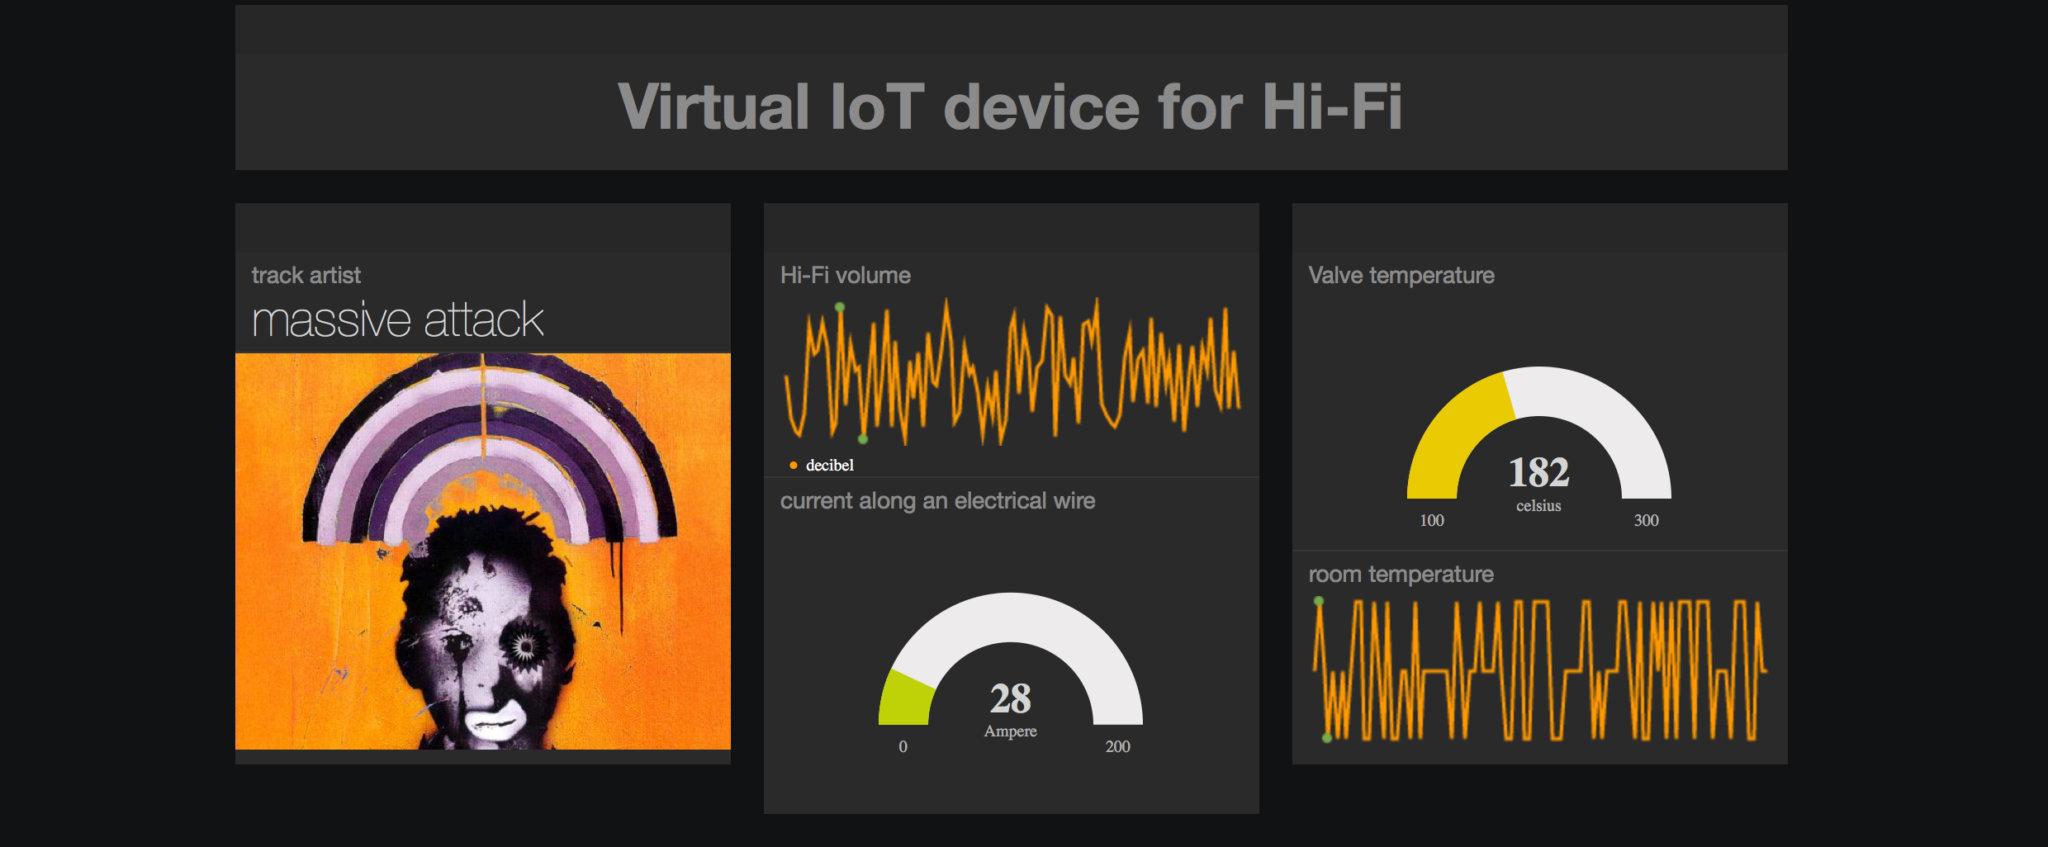 Virtual IoT device